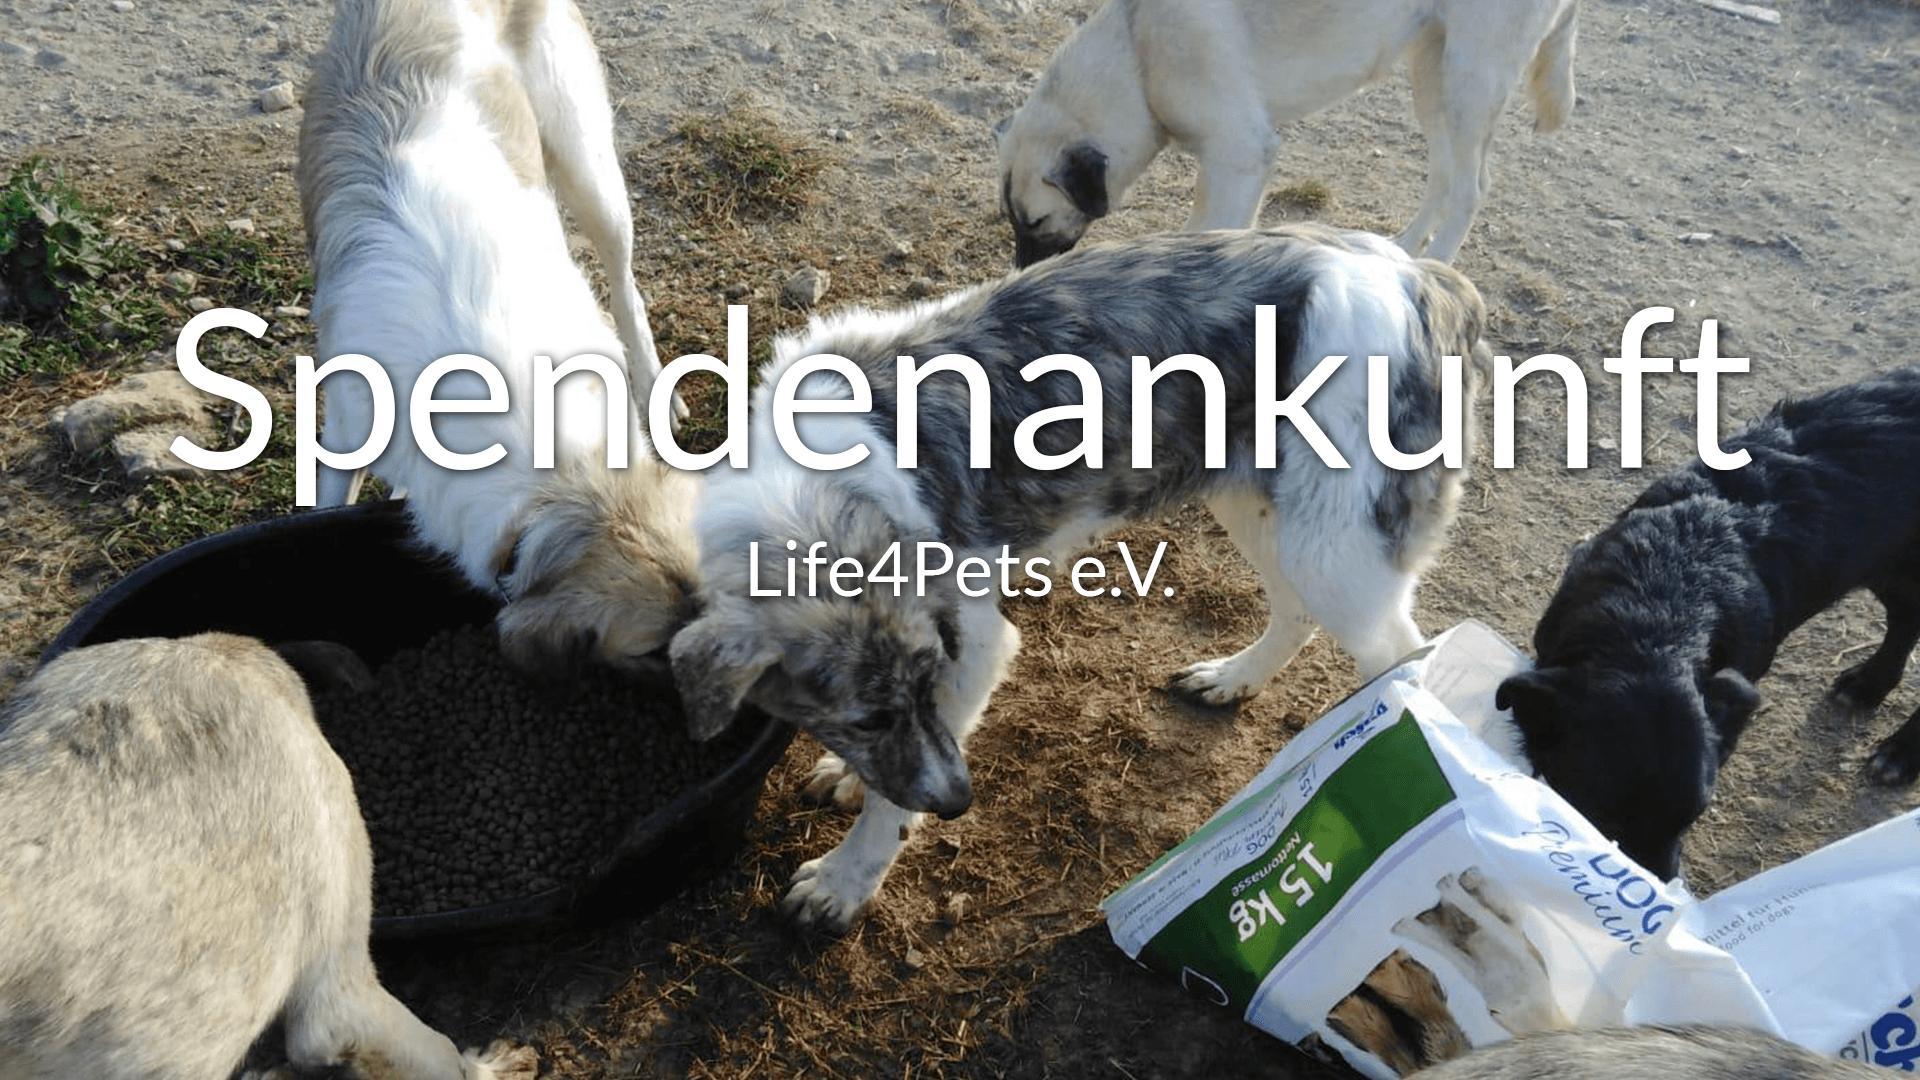 Thumbnail-Life4Pets e.V.-Futterspendenankunft-September-2019-ThdM-Rumänien-VIDEO-1